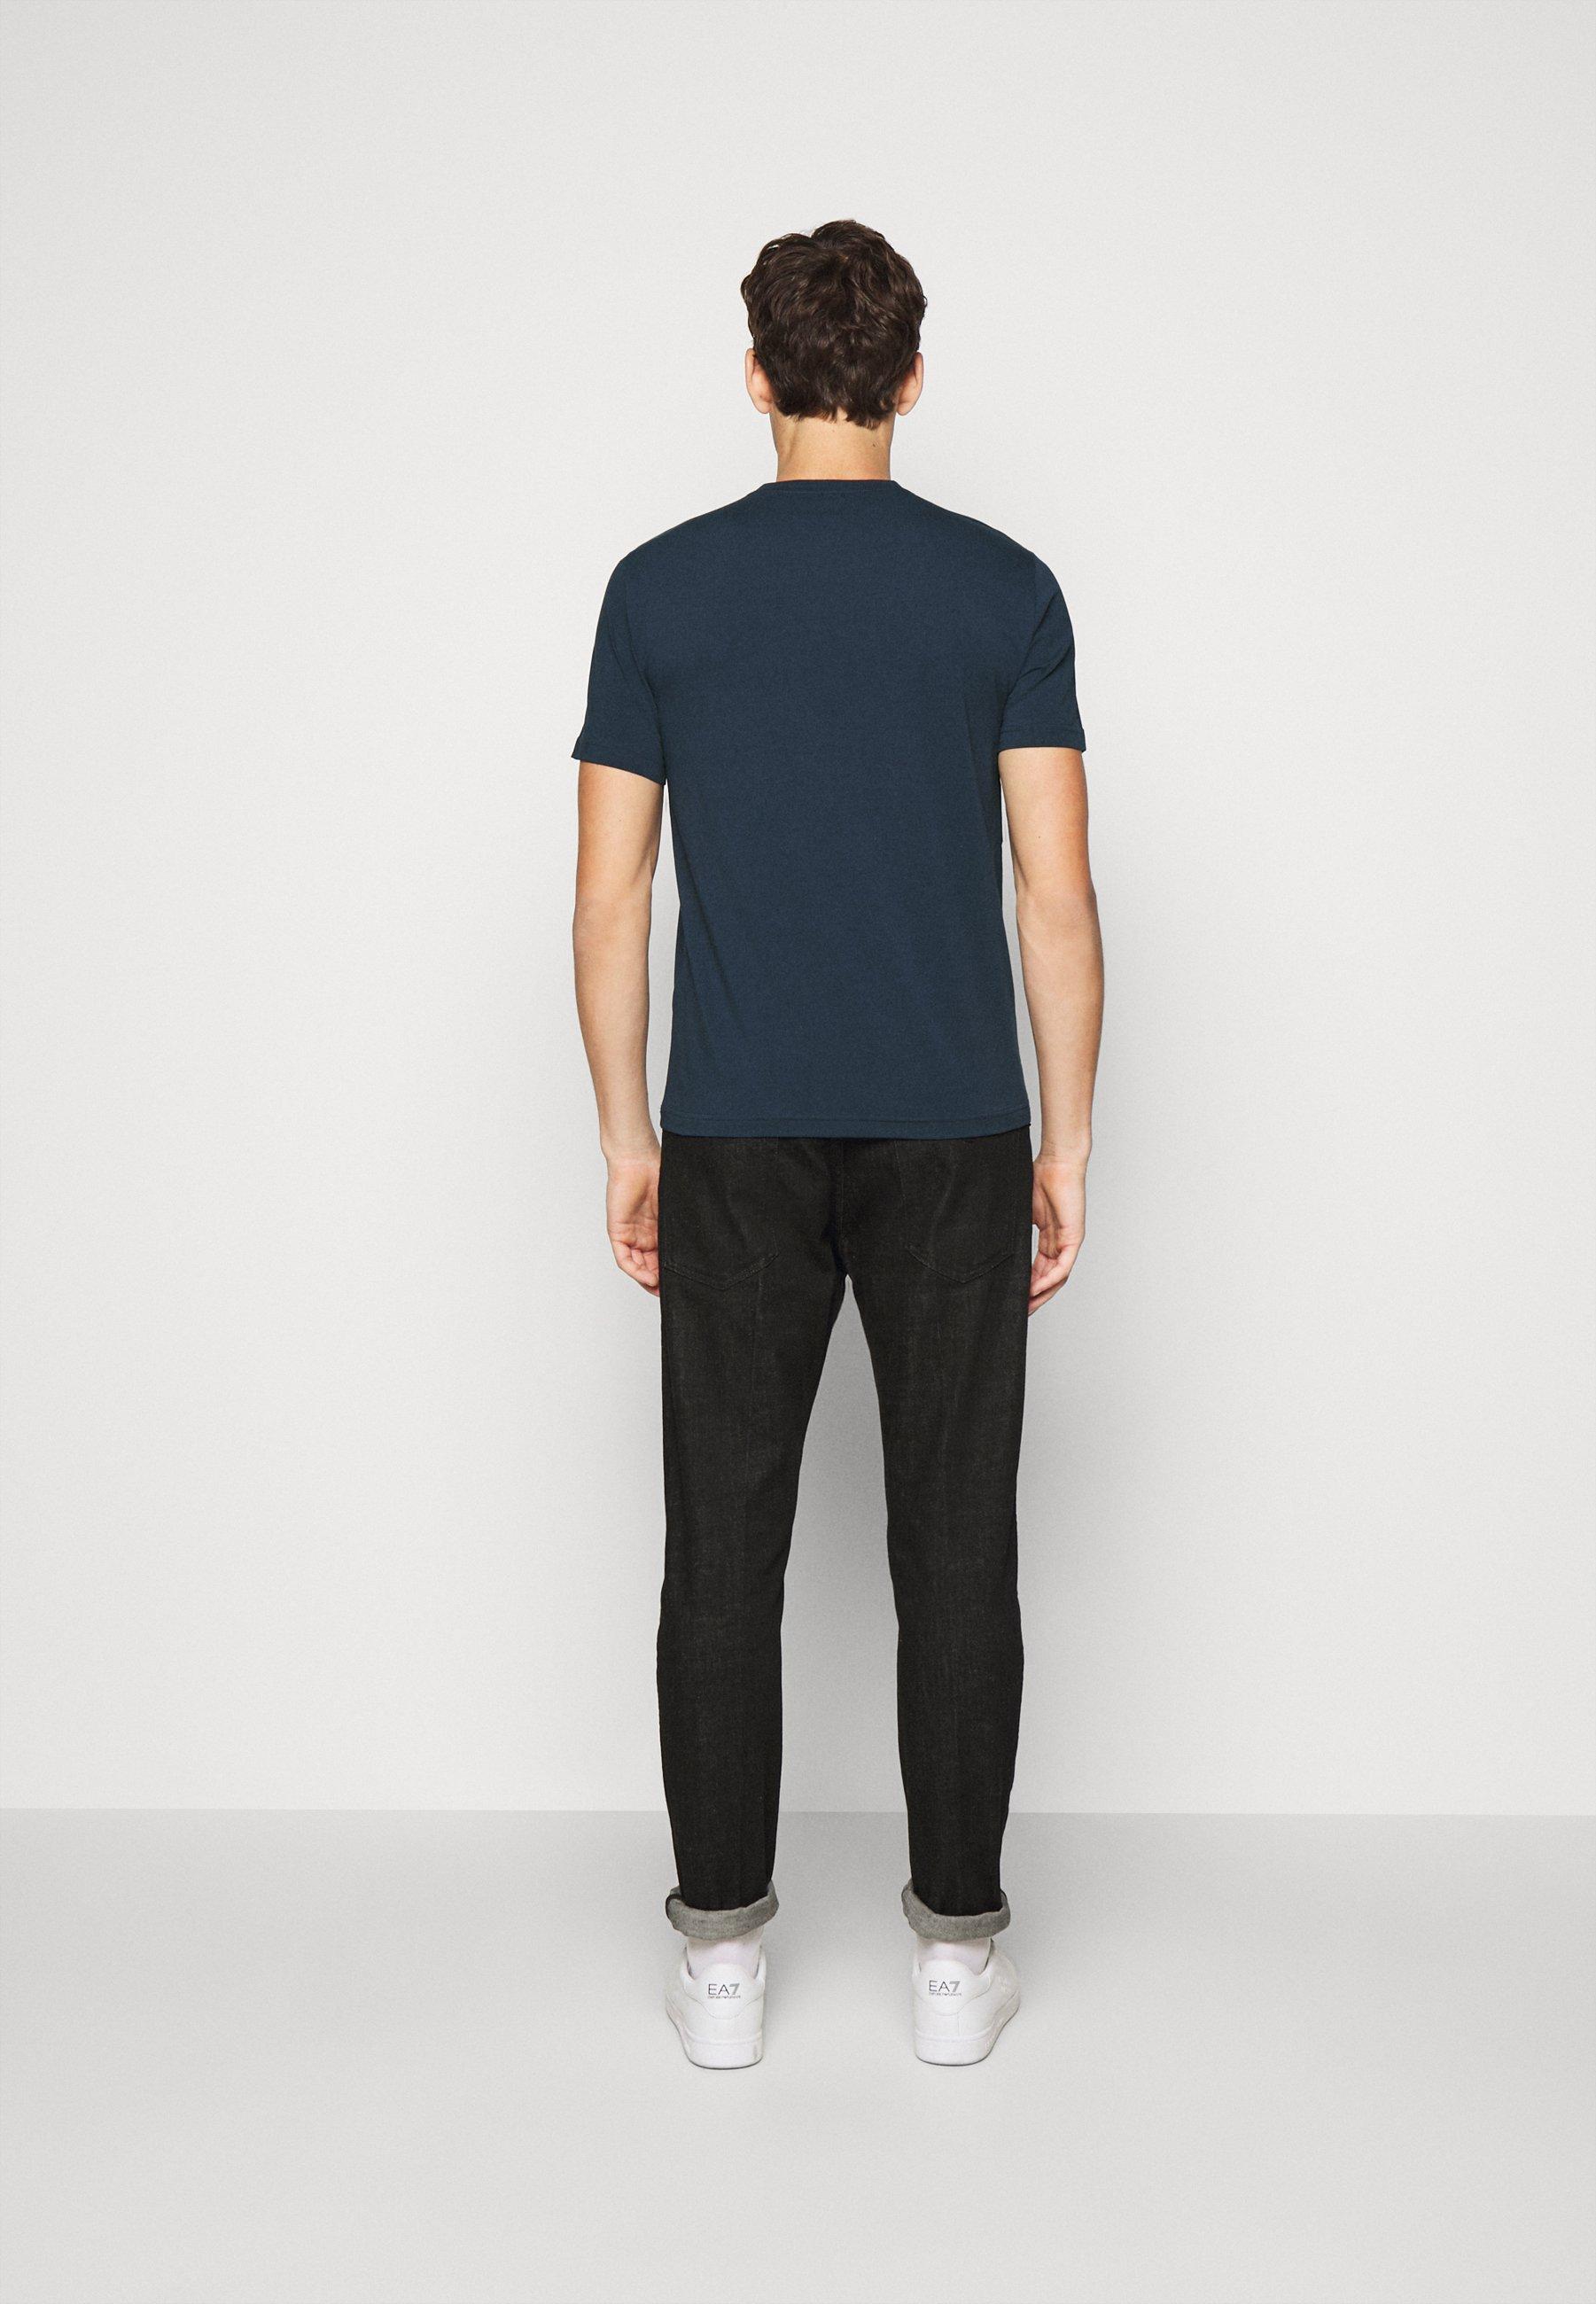 EA7 Emporio Armani Print T-shirt - navy blue 6n2iZ